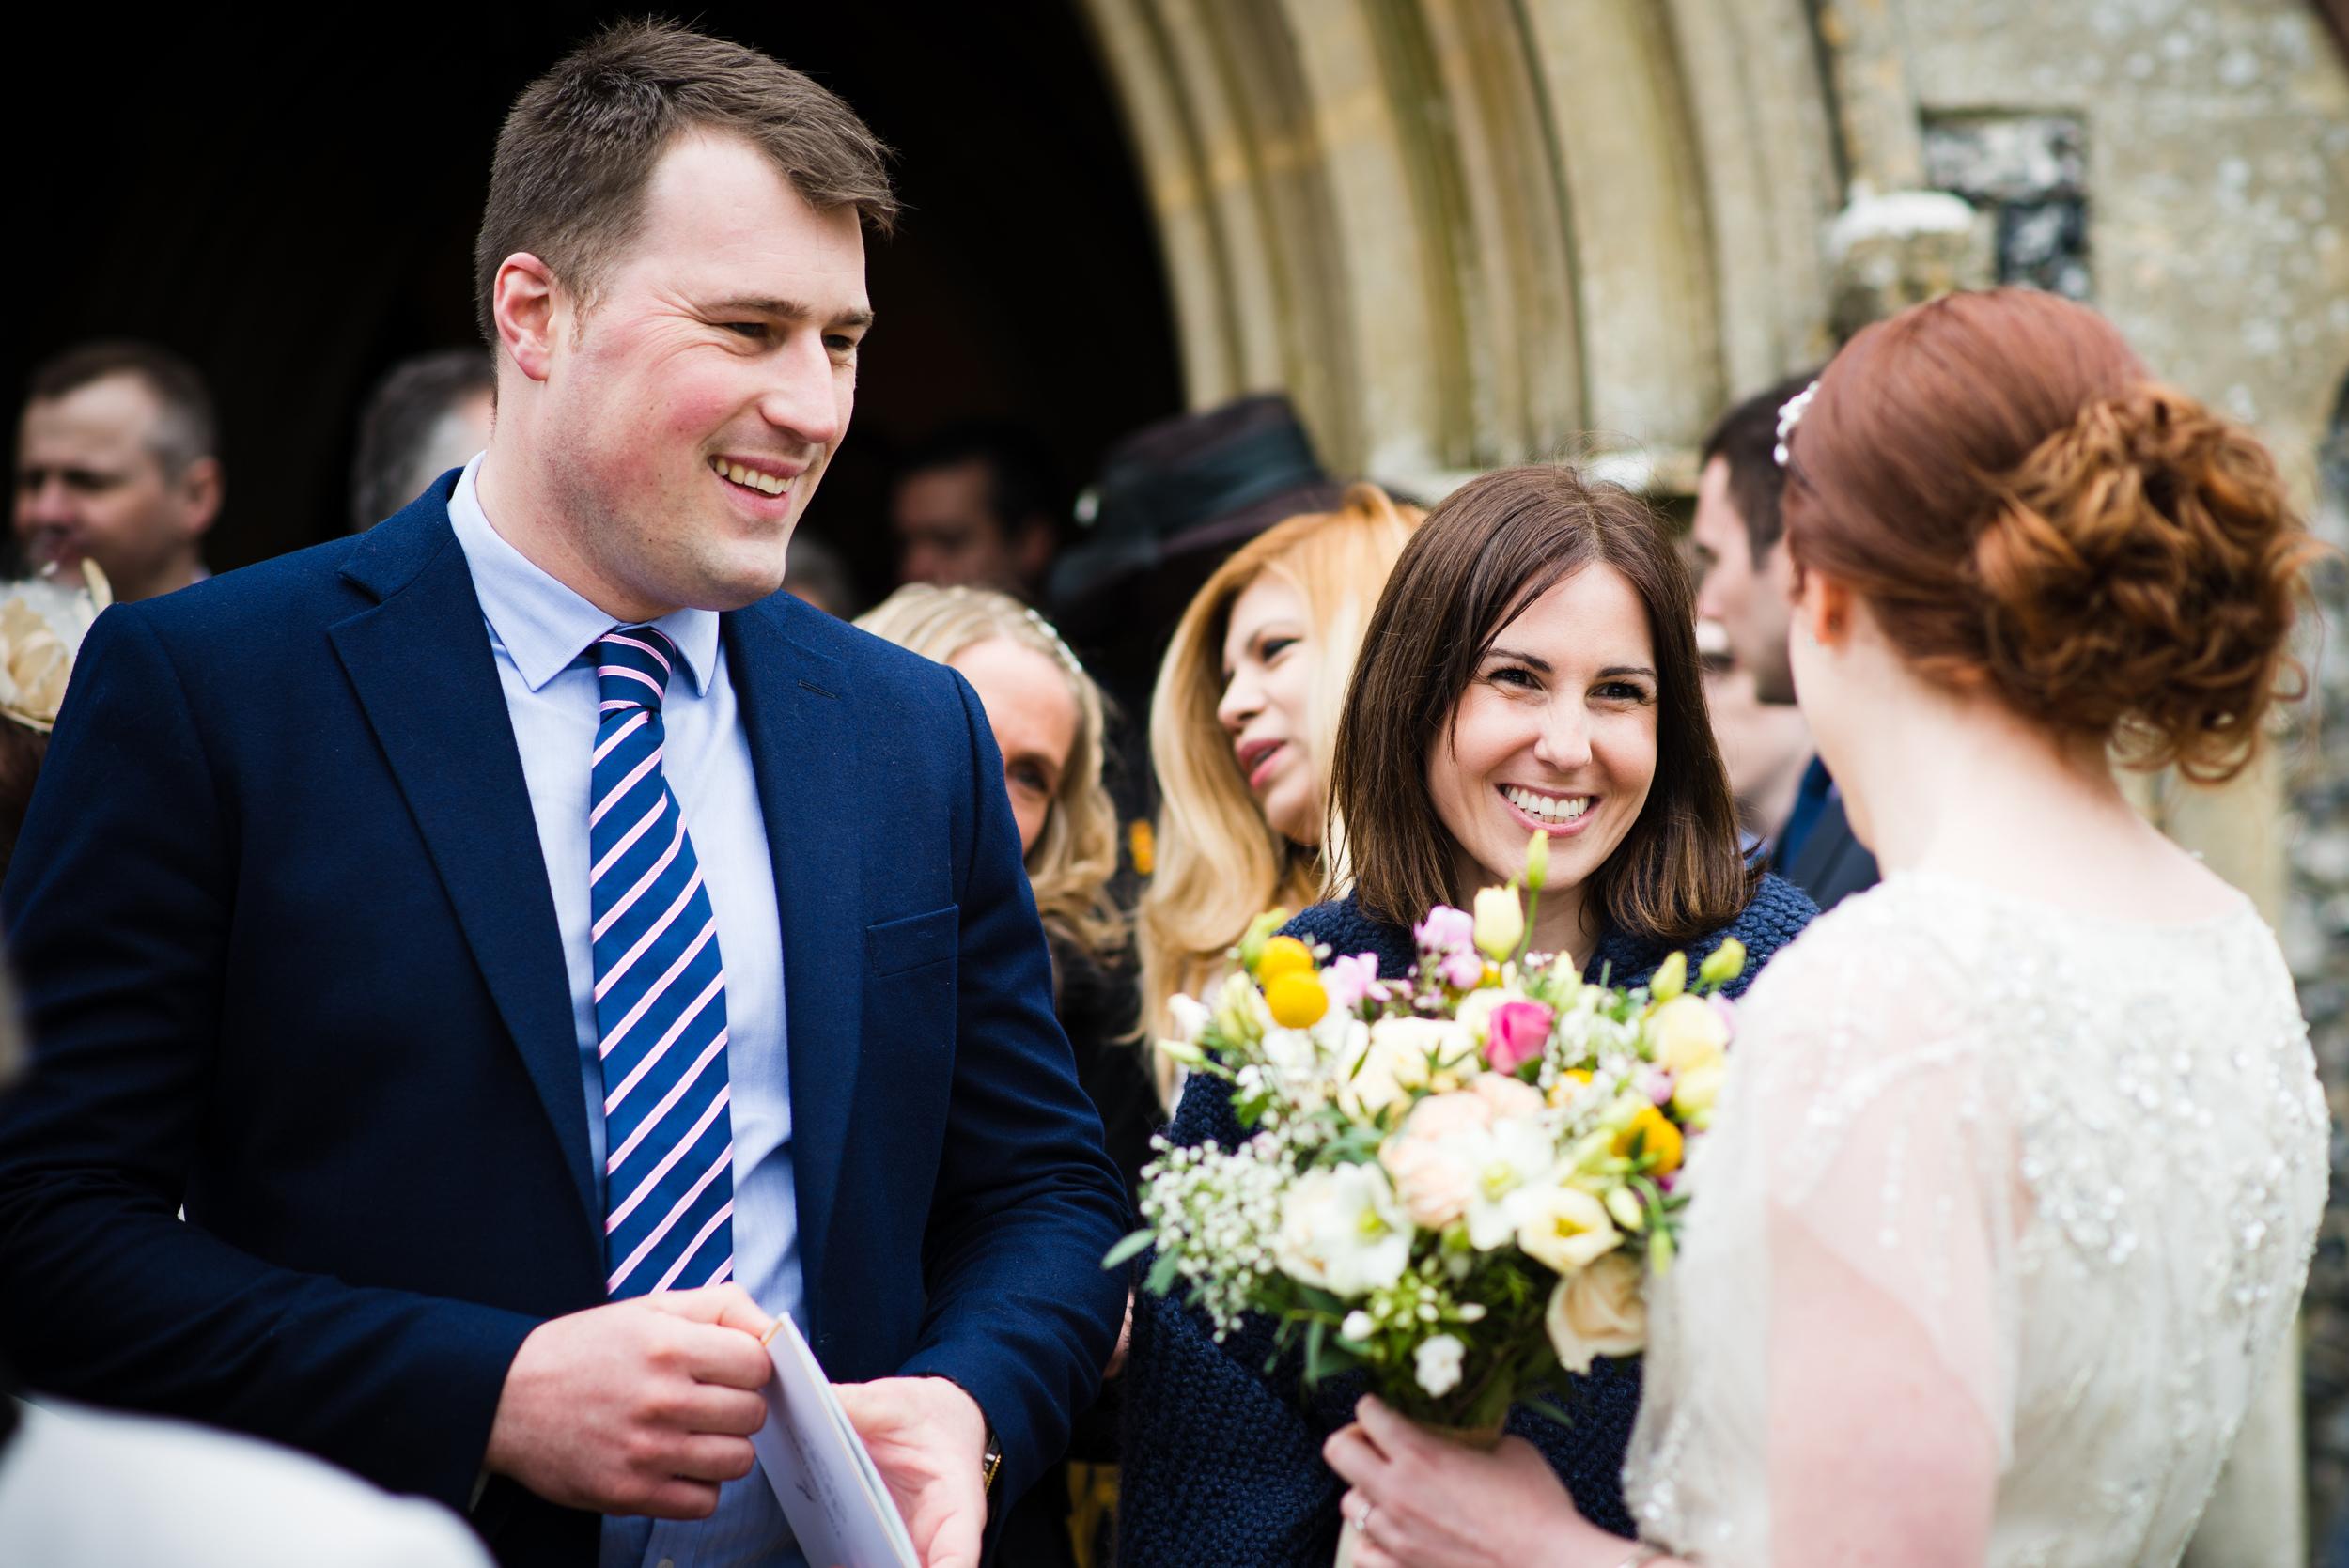 Michelle & James wedding photos-156.jpg